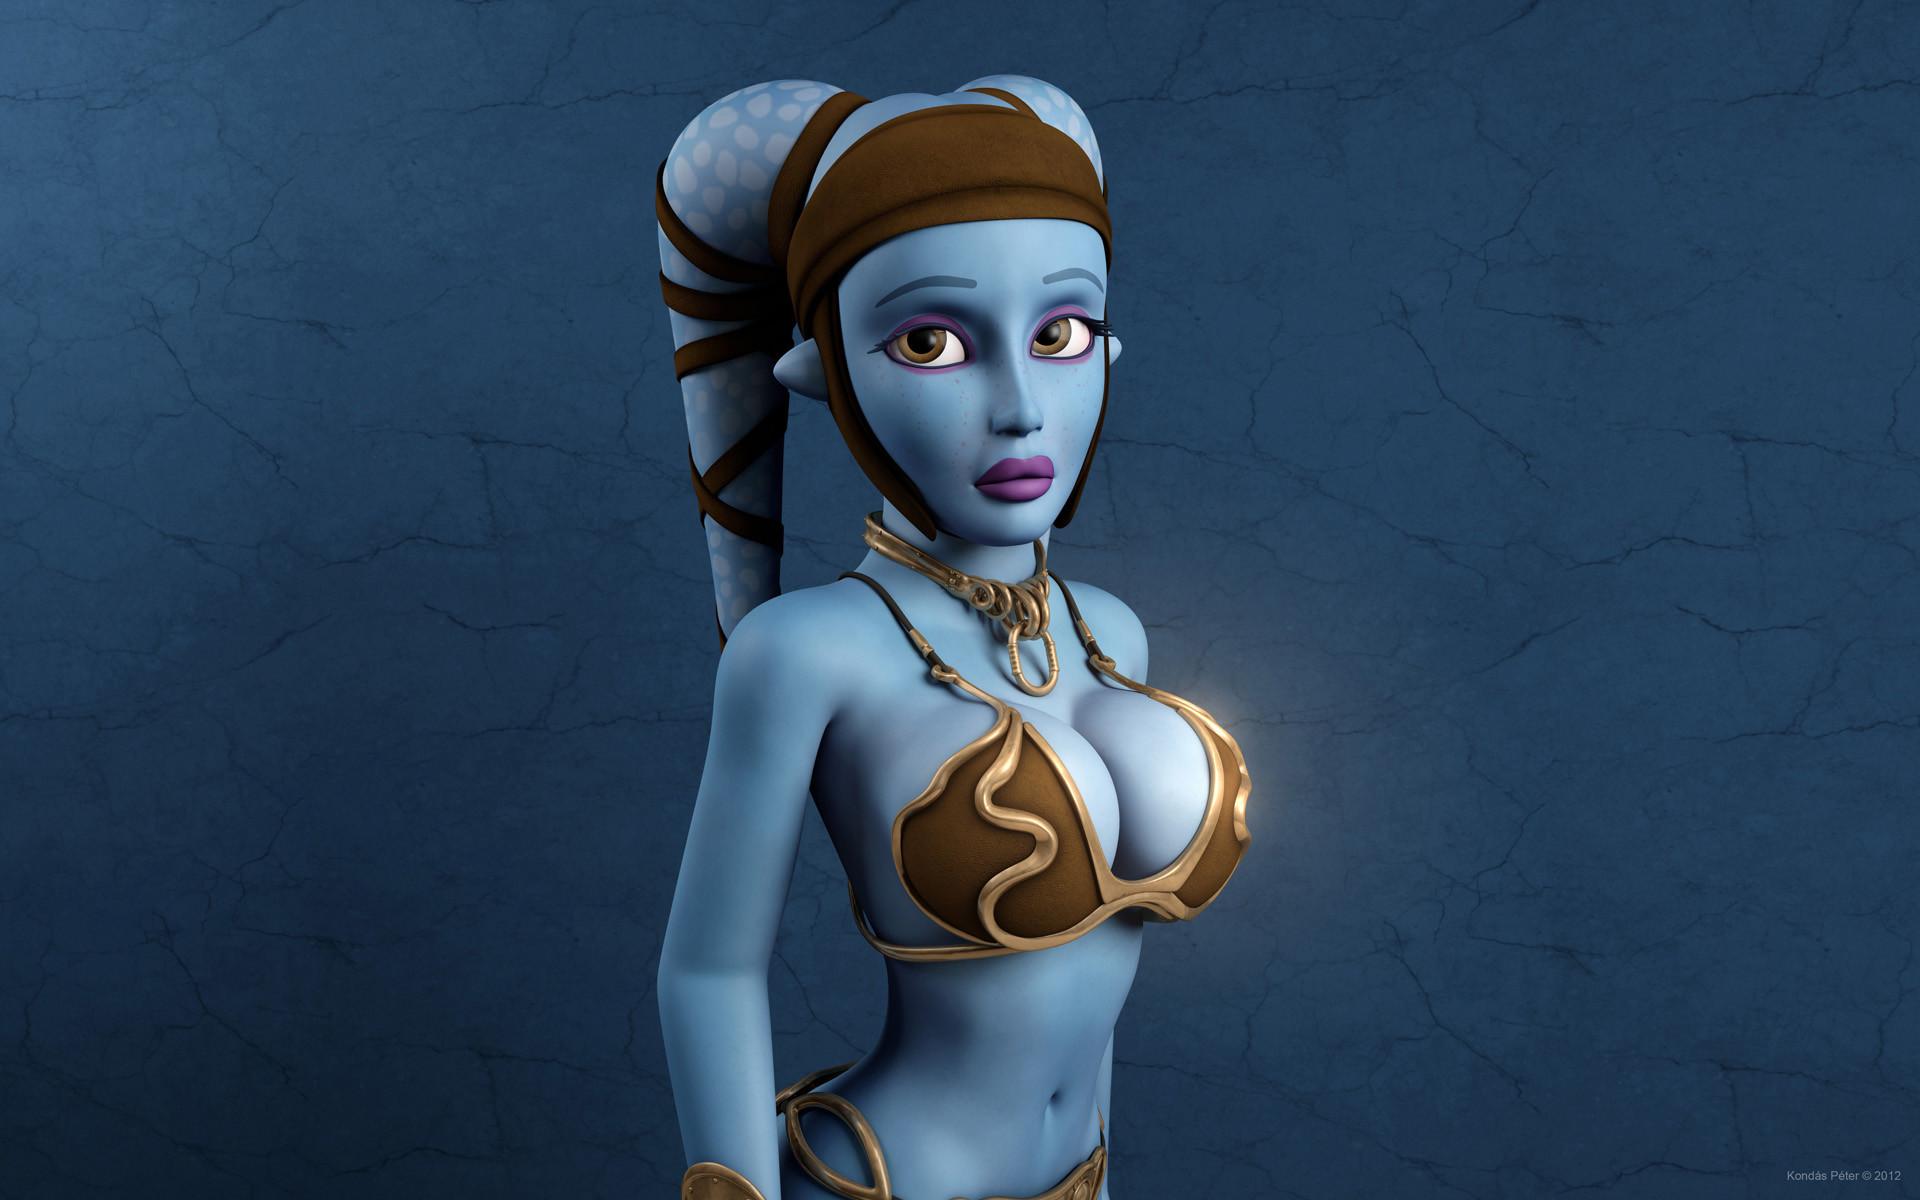 Aayla Secura naked 677